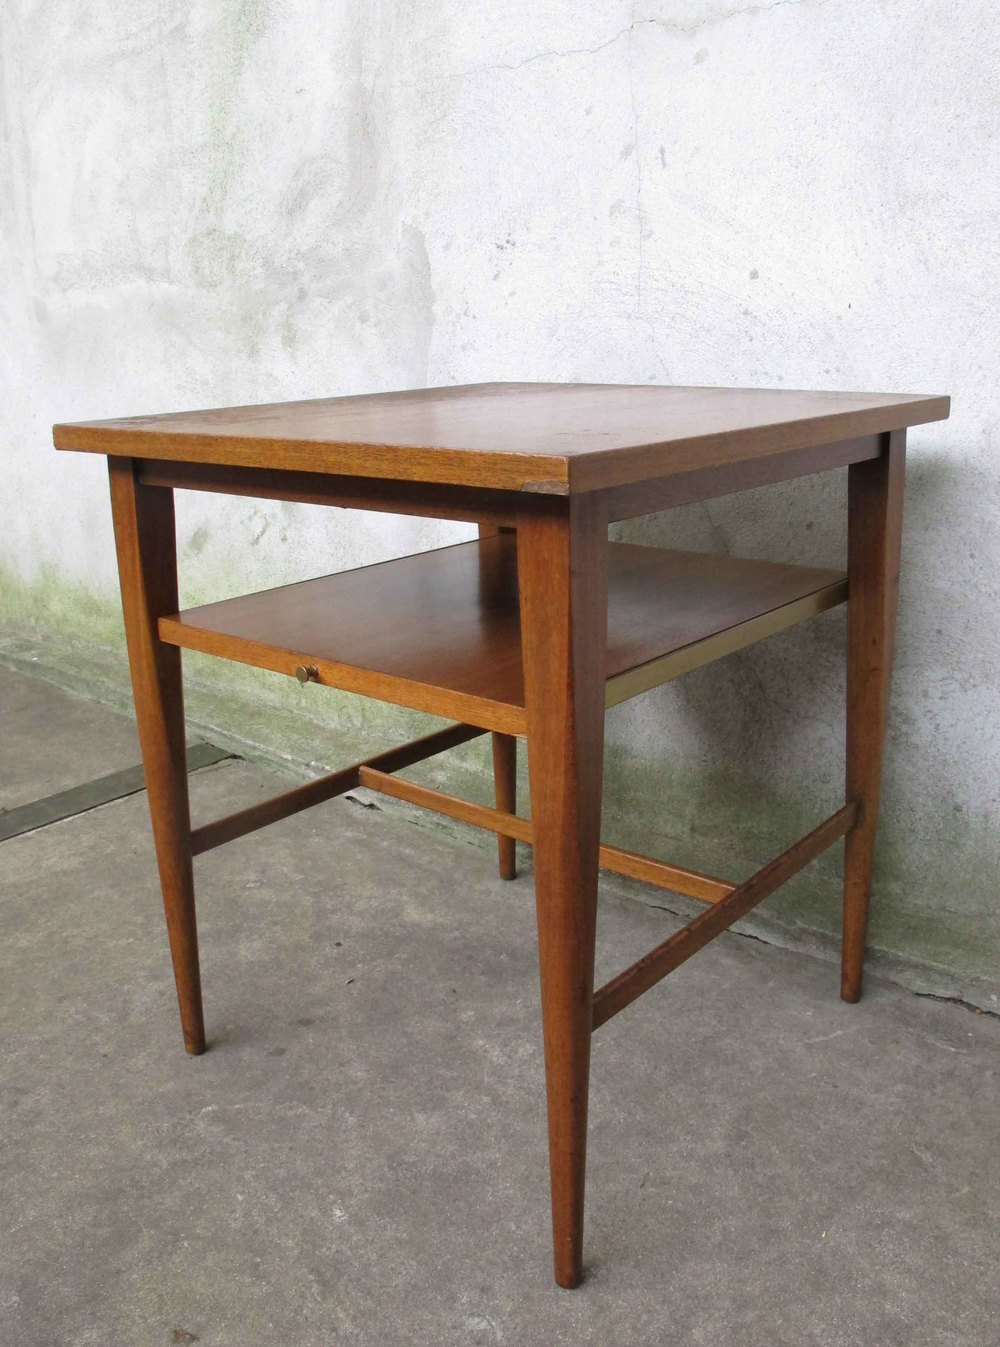 MID CENTURY PAUL MCCOBB SIDE TABLE FOR CALVIN GROUP